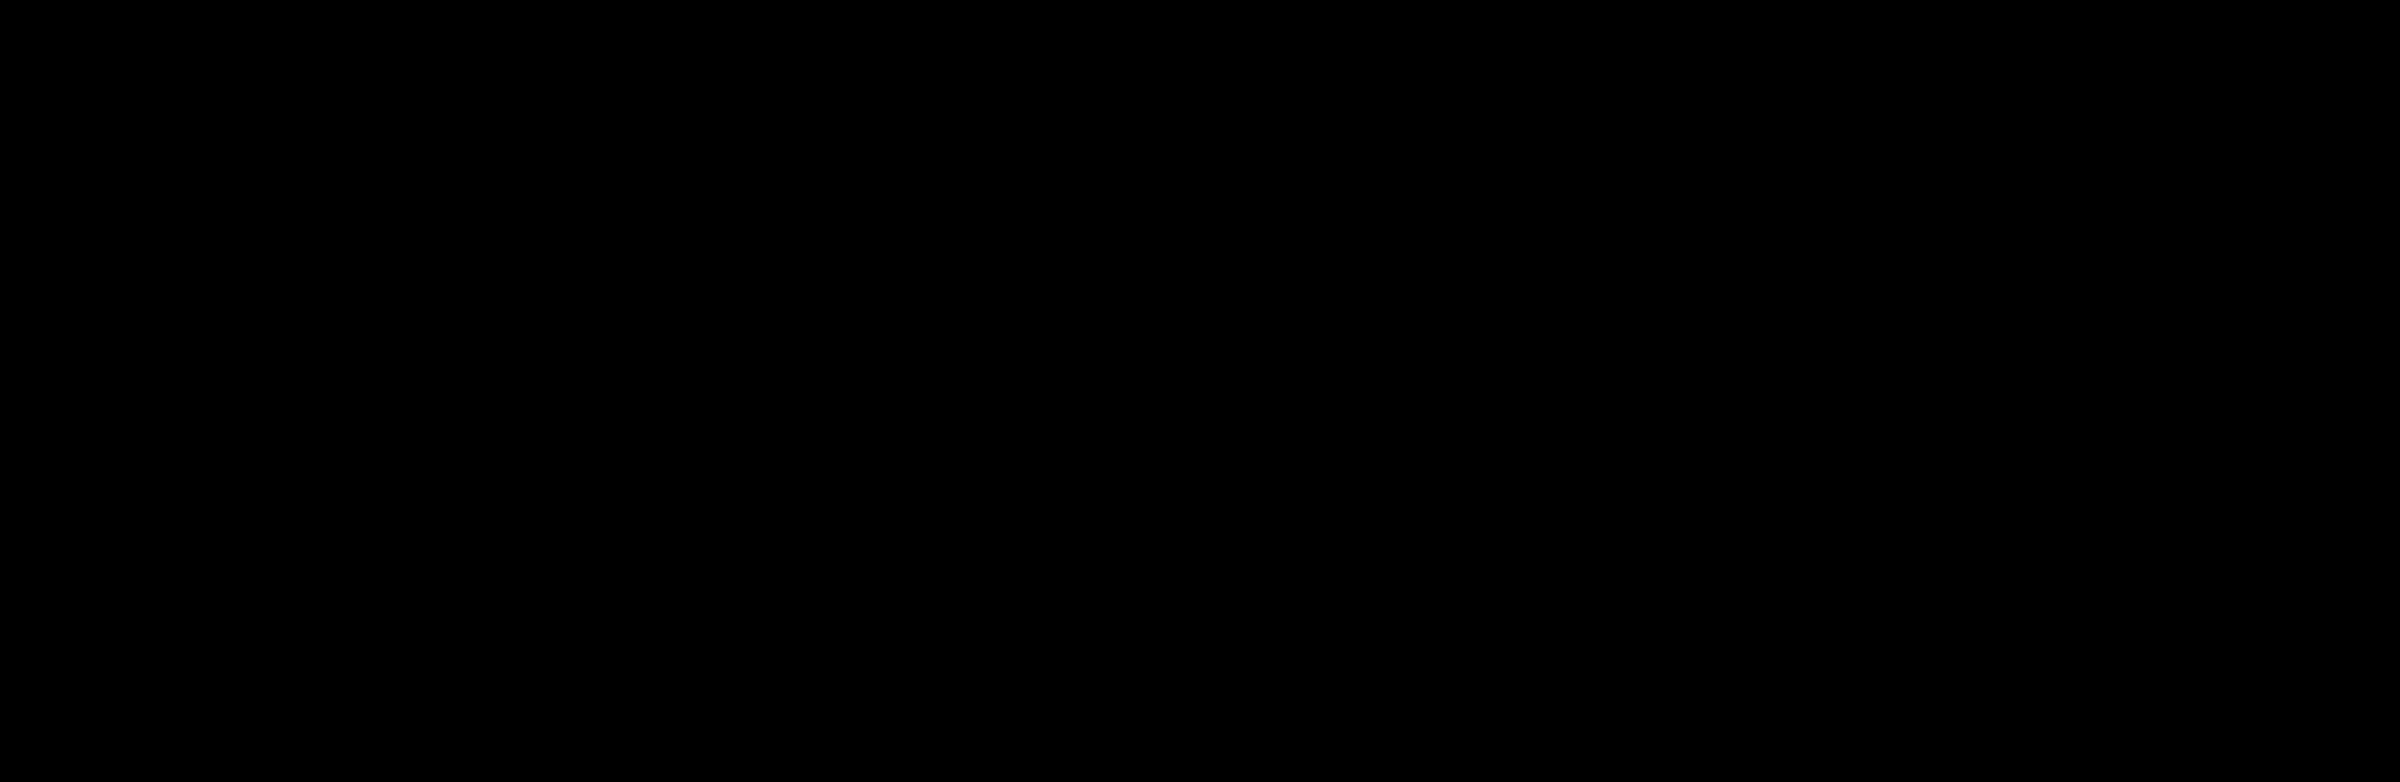 Keyboard Clipart Keybord Keyboard Keybord Transparent